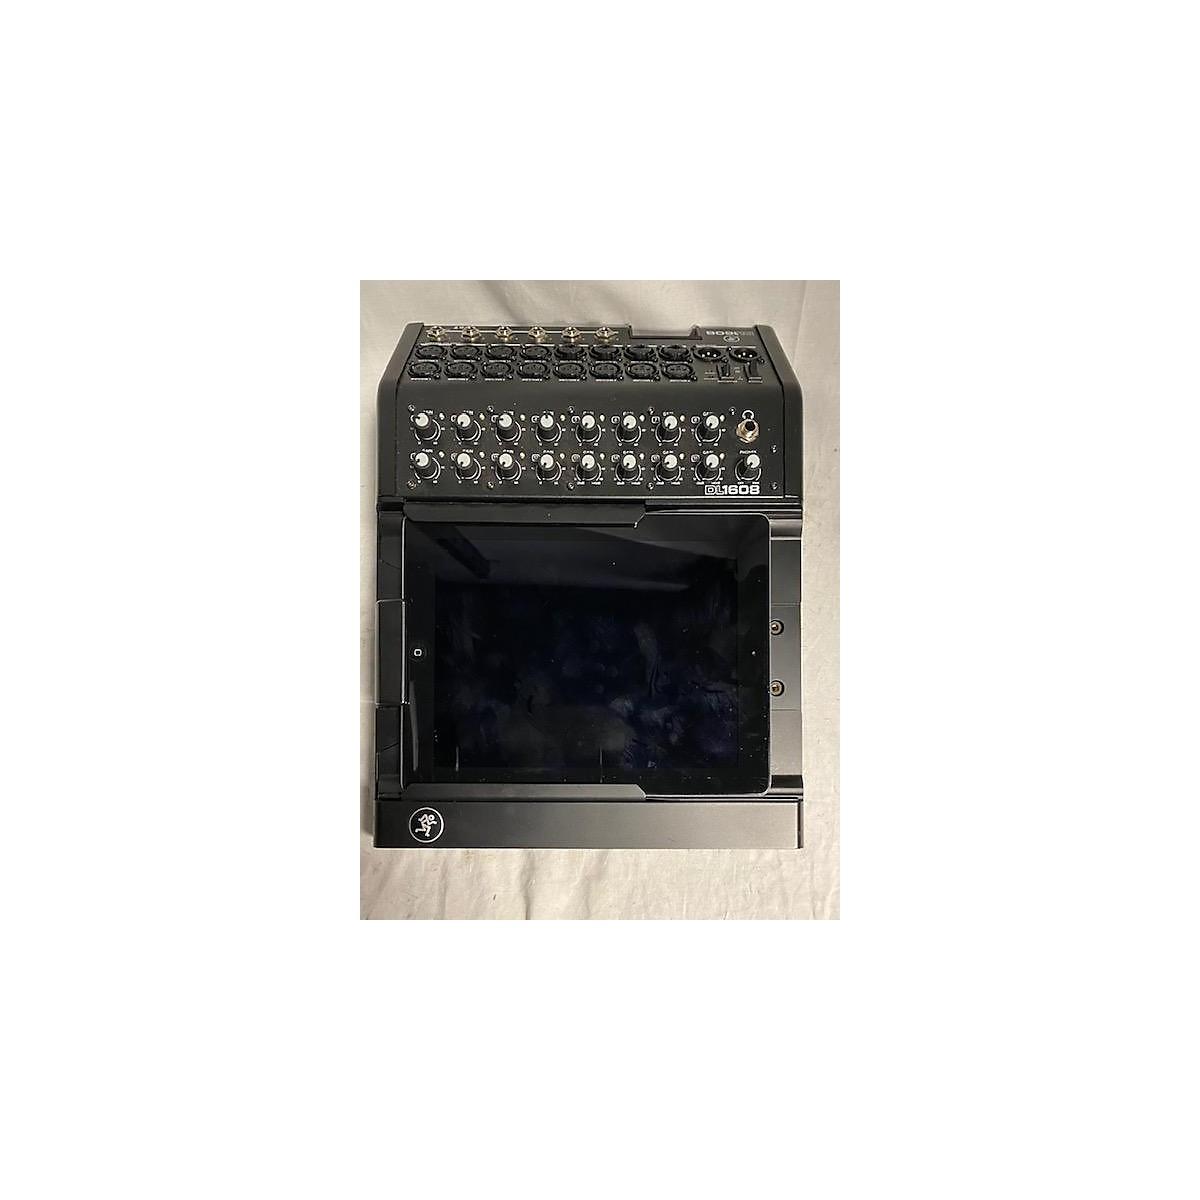 Mackie DL1608 With 1st Gen Ipad Digital Mixer